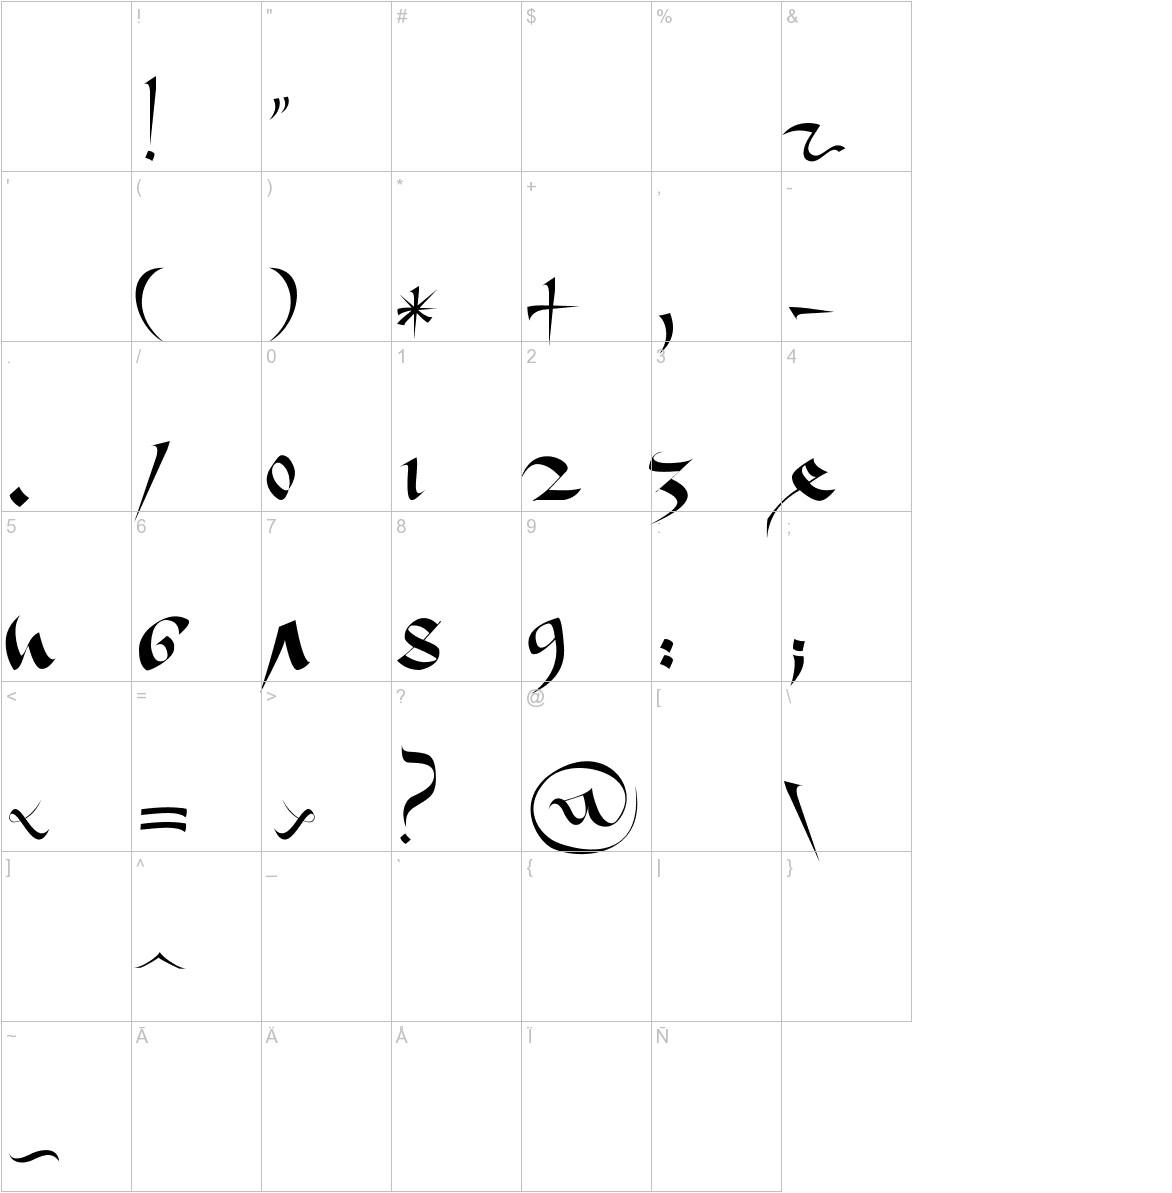 1413 Cursive characters